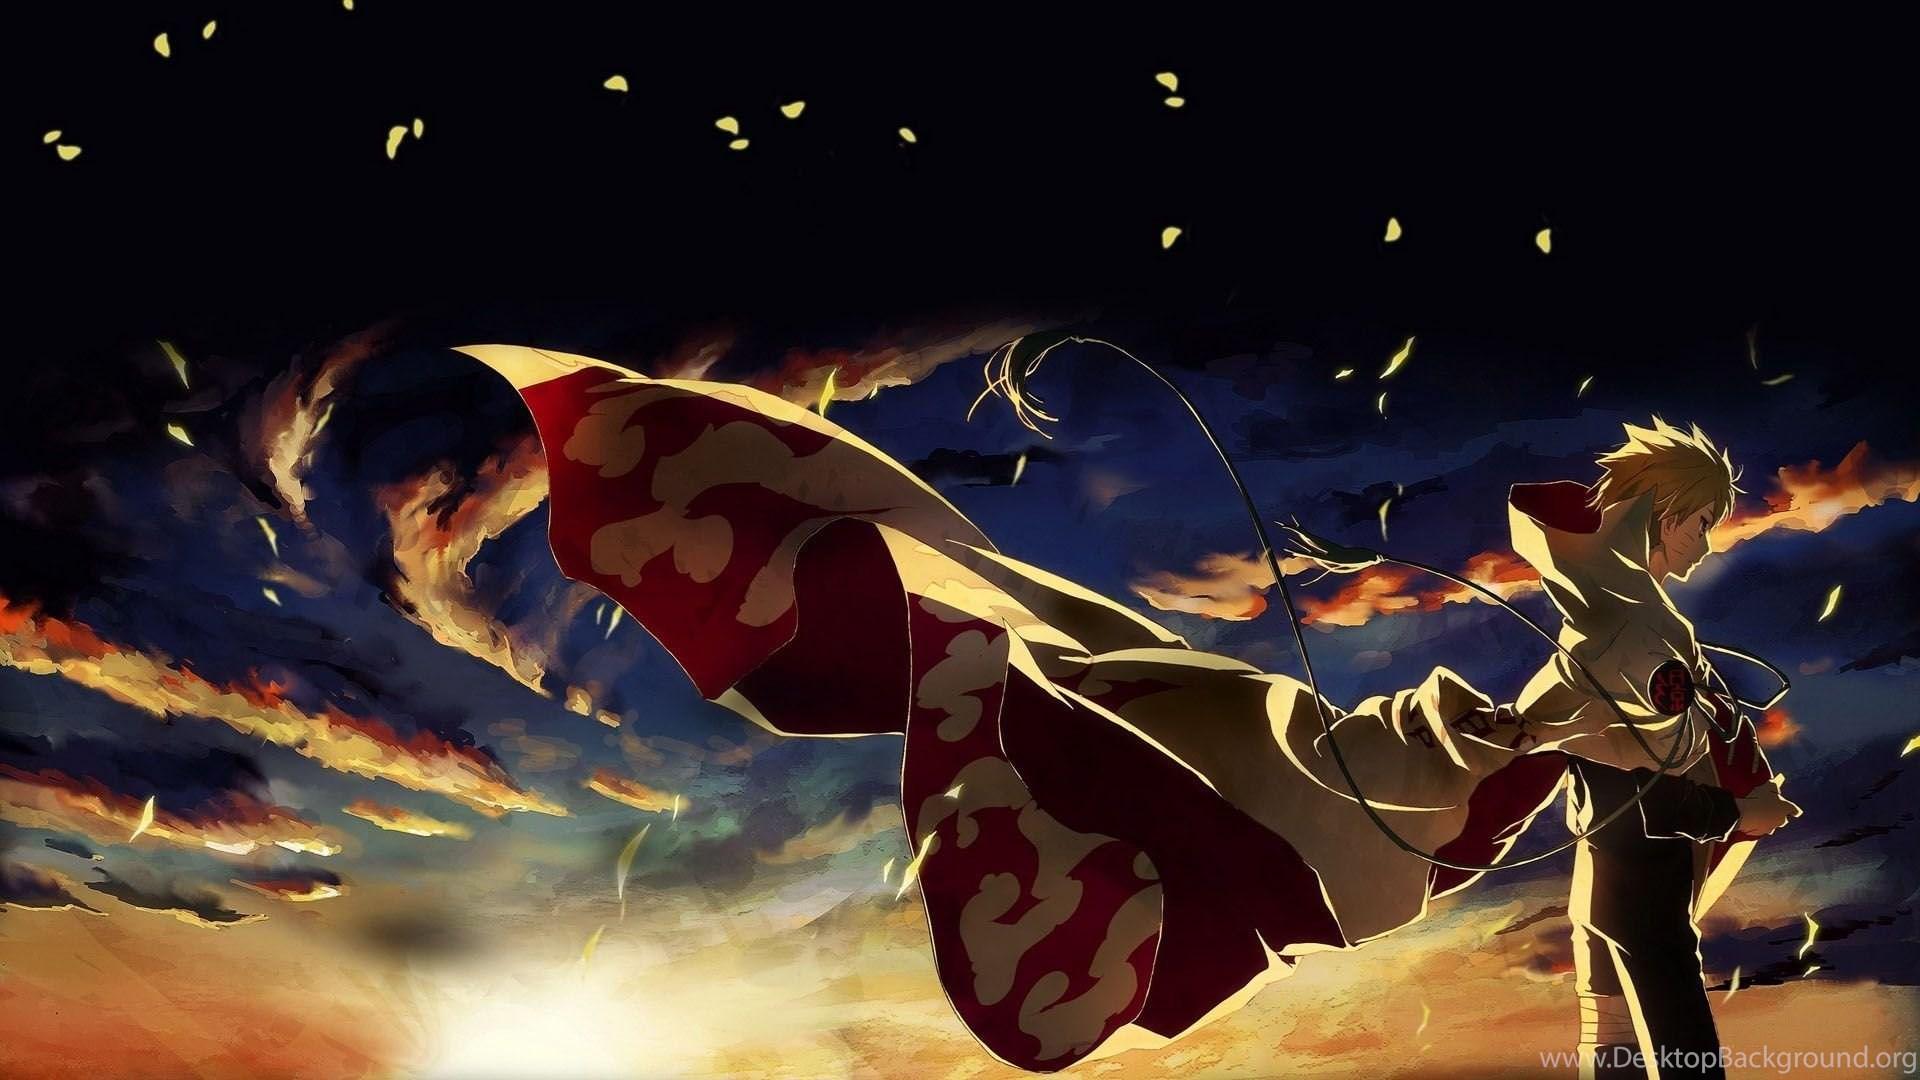 Hd Wallpapers Cool Anime Boy Wallpapers Desktop Background